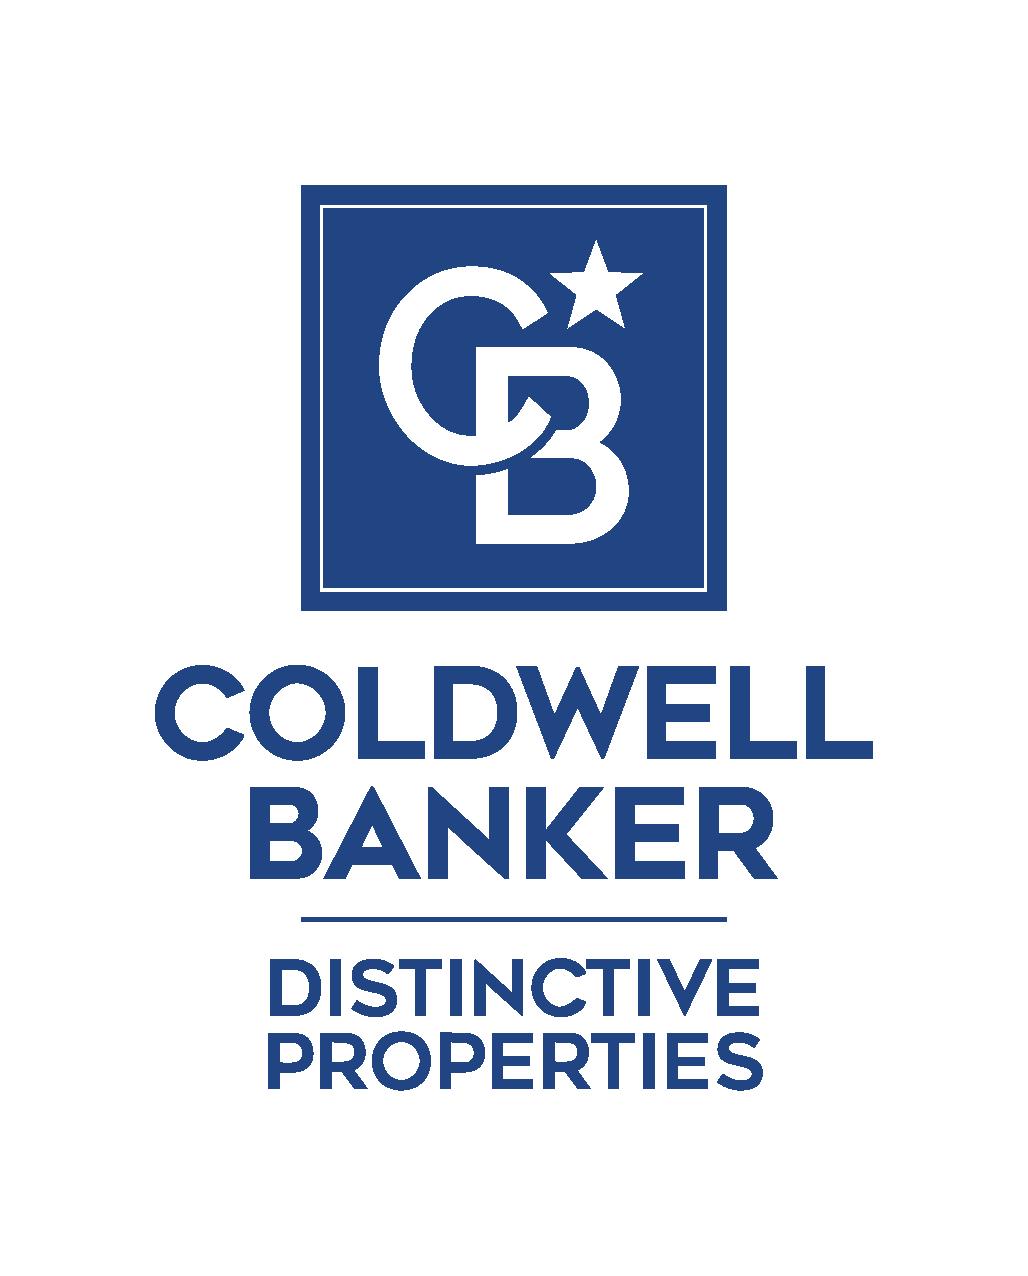 Christine Phillips - Coldwell Banker Distinctive Properties Logo